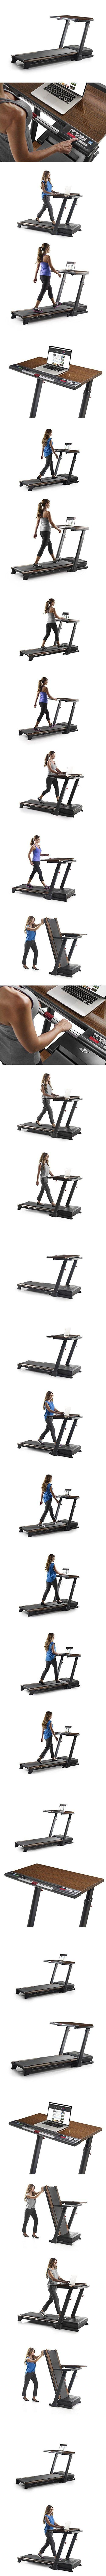 NordicTrack Desk Treadmill